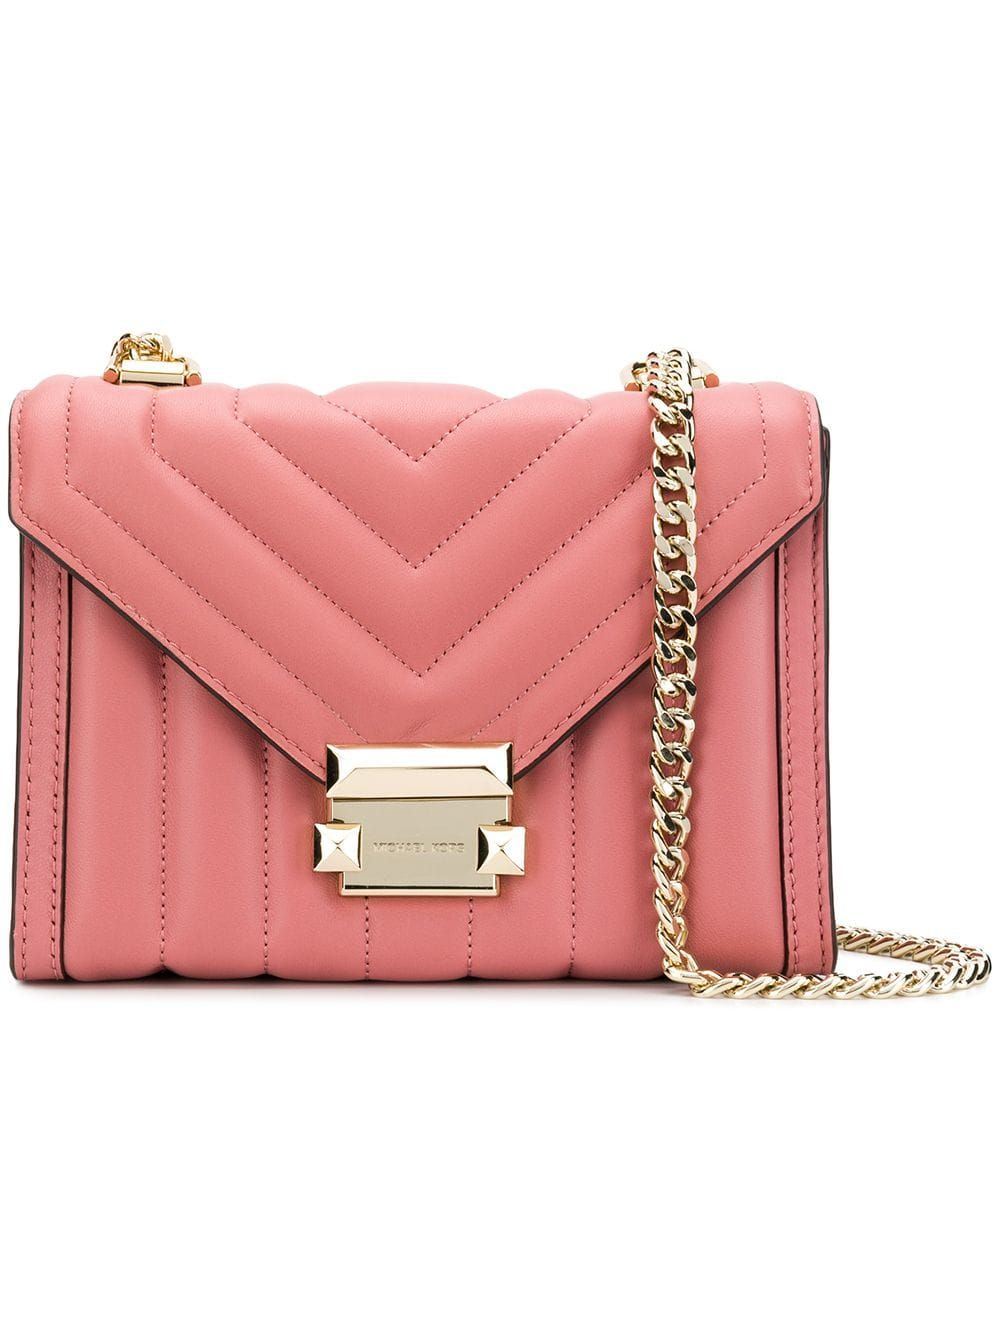 1254848fc Michael Michael Kors Whitney shoulder bag - Pink Michael Michael Kors  Whitney Shoulder Bag - Farfetch